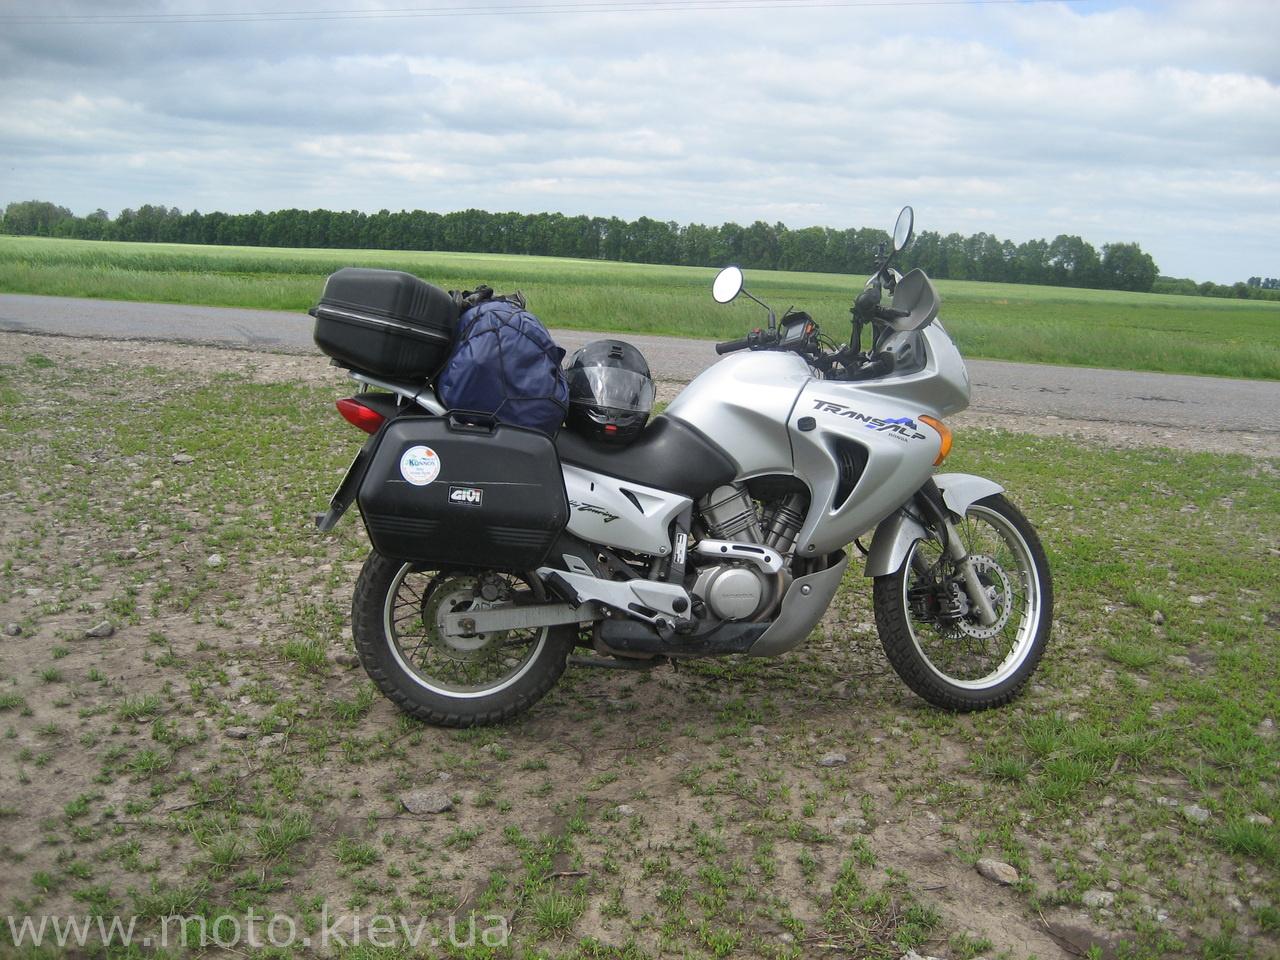 Мотоцикл  Honda XL 650  4500 USD Торг  Продана